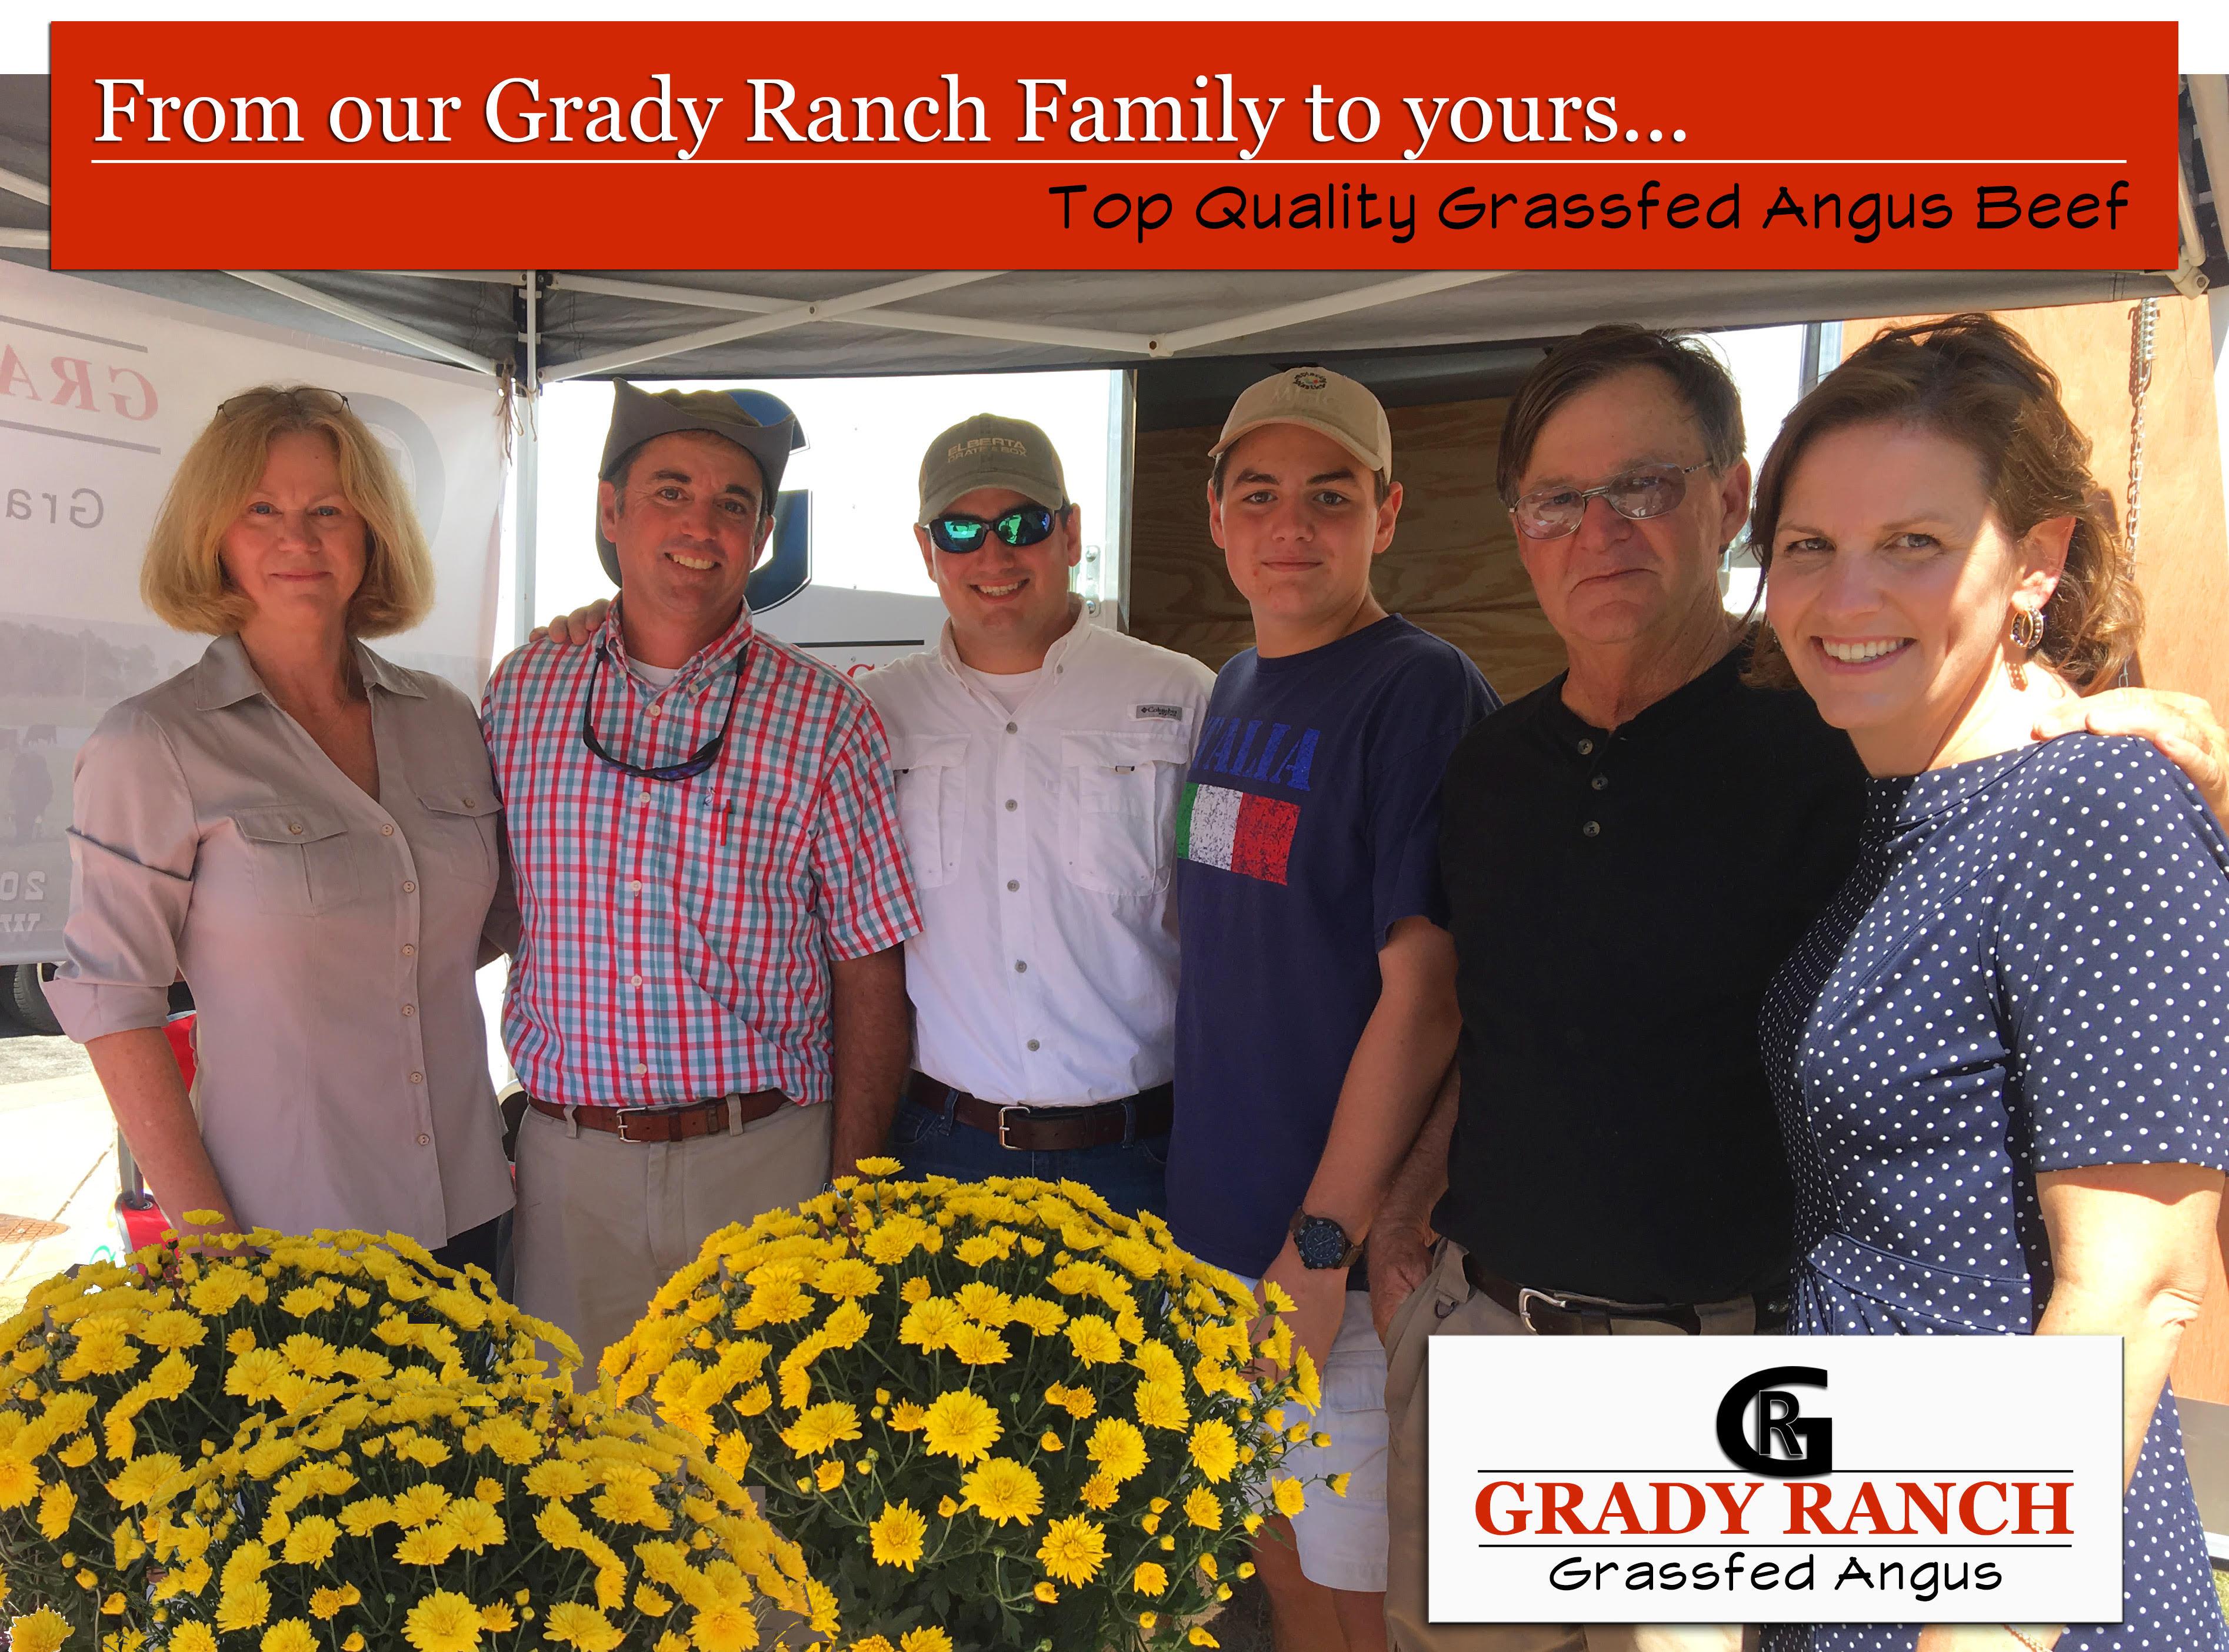 Grady Ranch